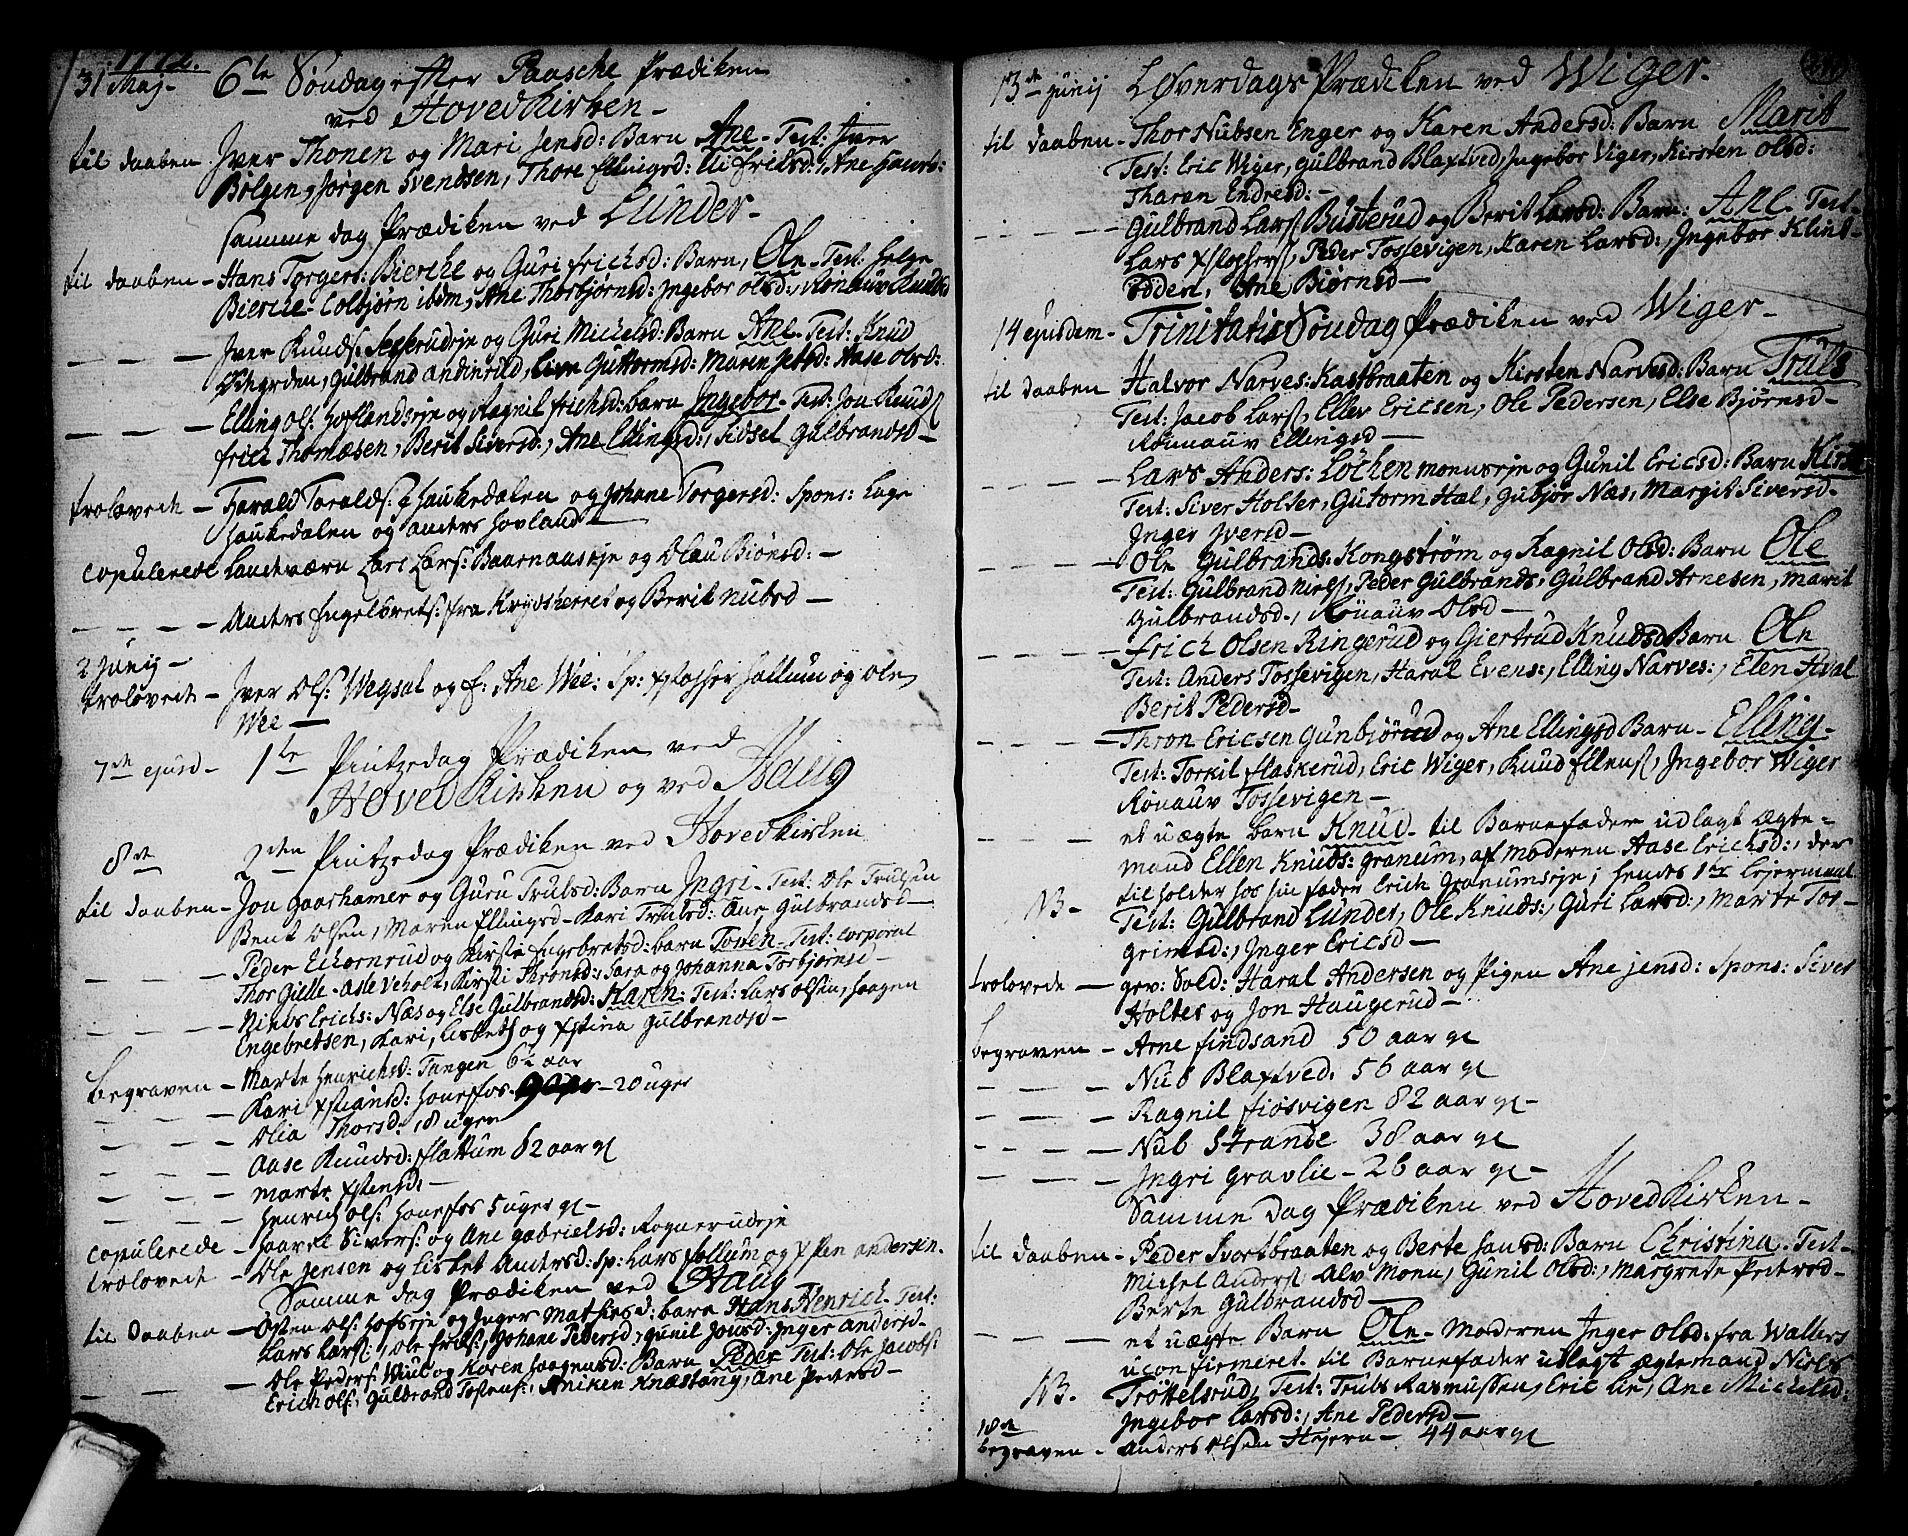 SAKO, Norderhov kirkebøker, F/Fa/L0004: Parish register (official) no. 4, 1758-1774, p. 241